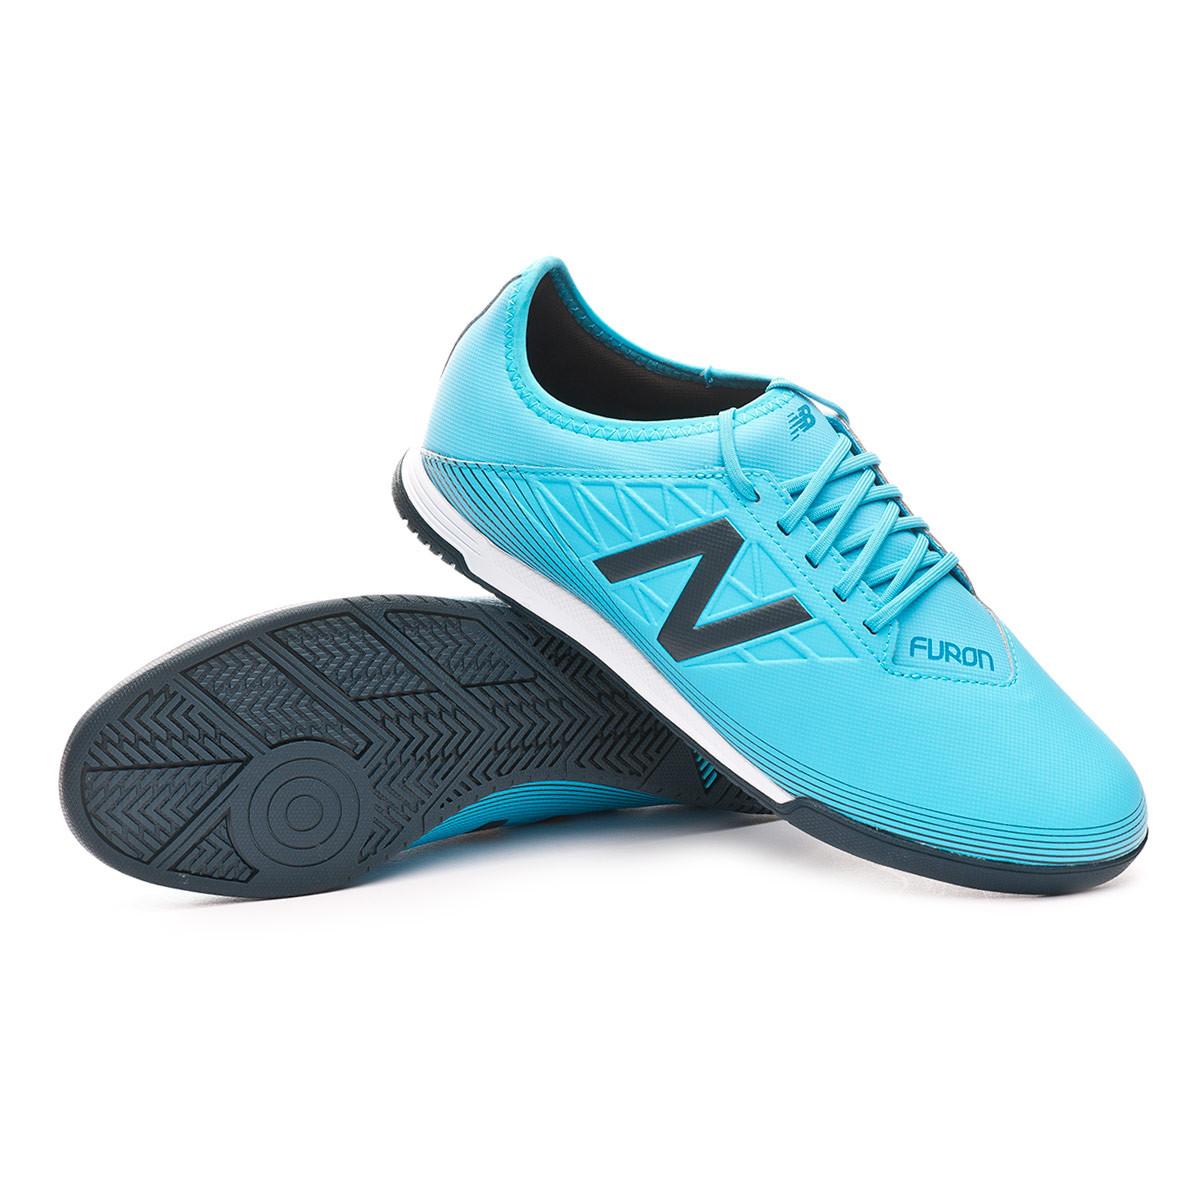 Chaussure de futsal New Balance Furon 5 Dispach Indoor Bayside ...